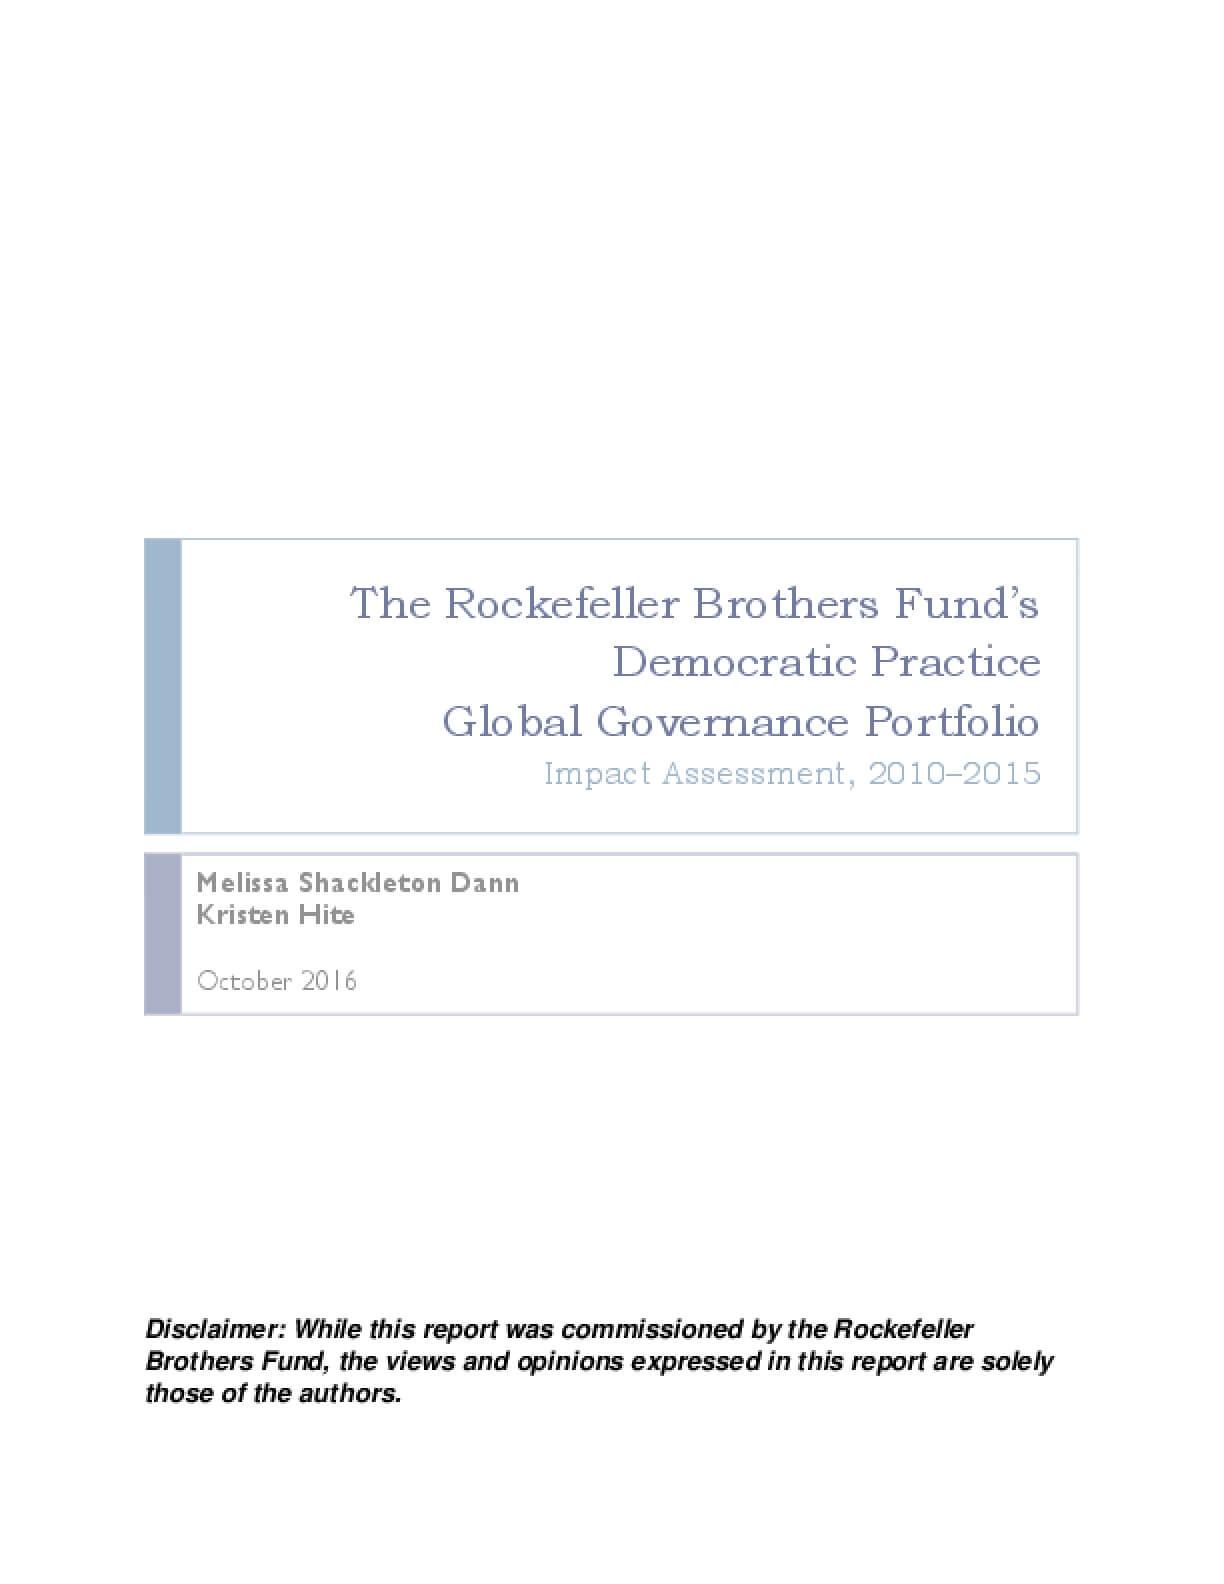 The Rockefeller Brothers Fund's Democratic Practice Global Governance Portfolio: Impact Assessment, 2010–2015